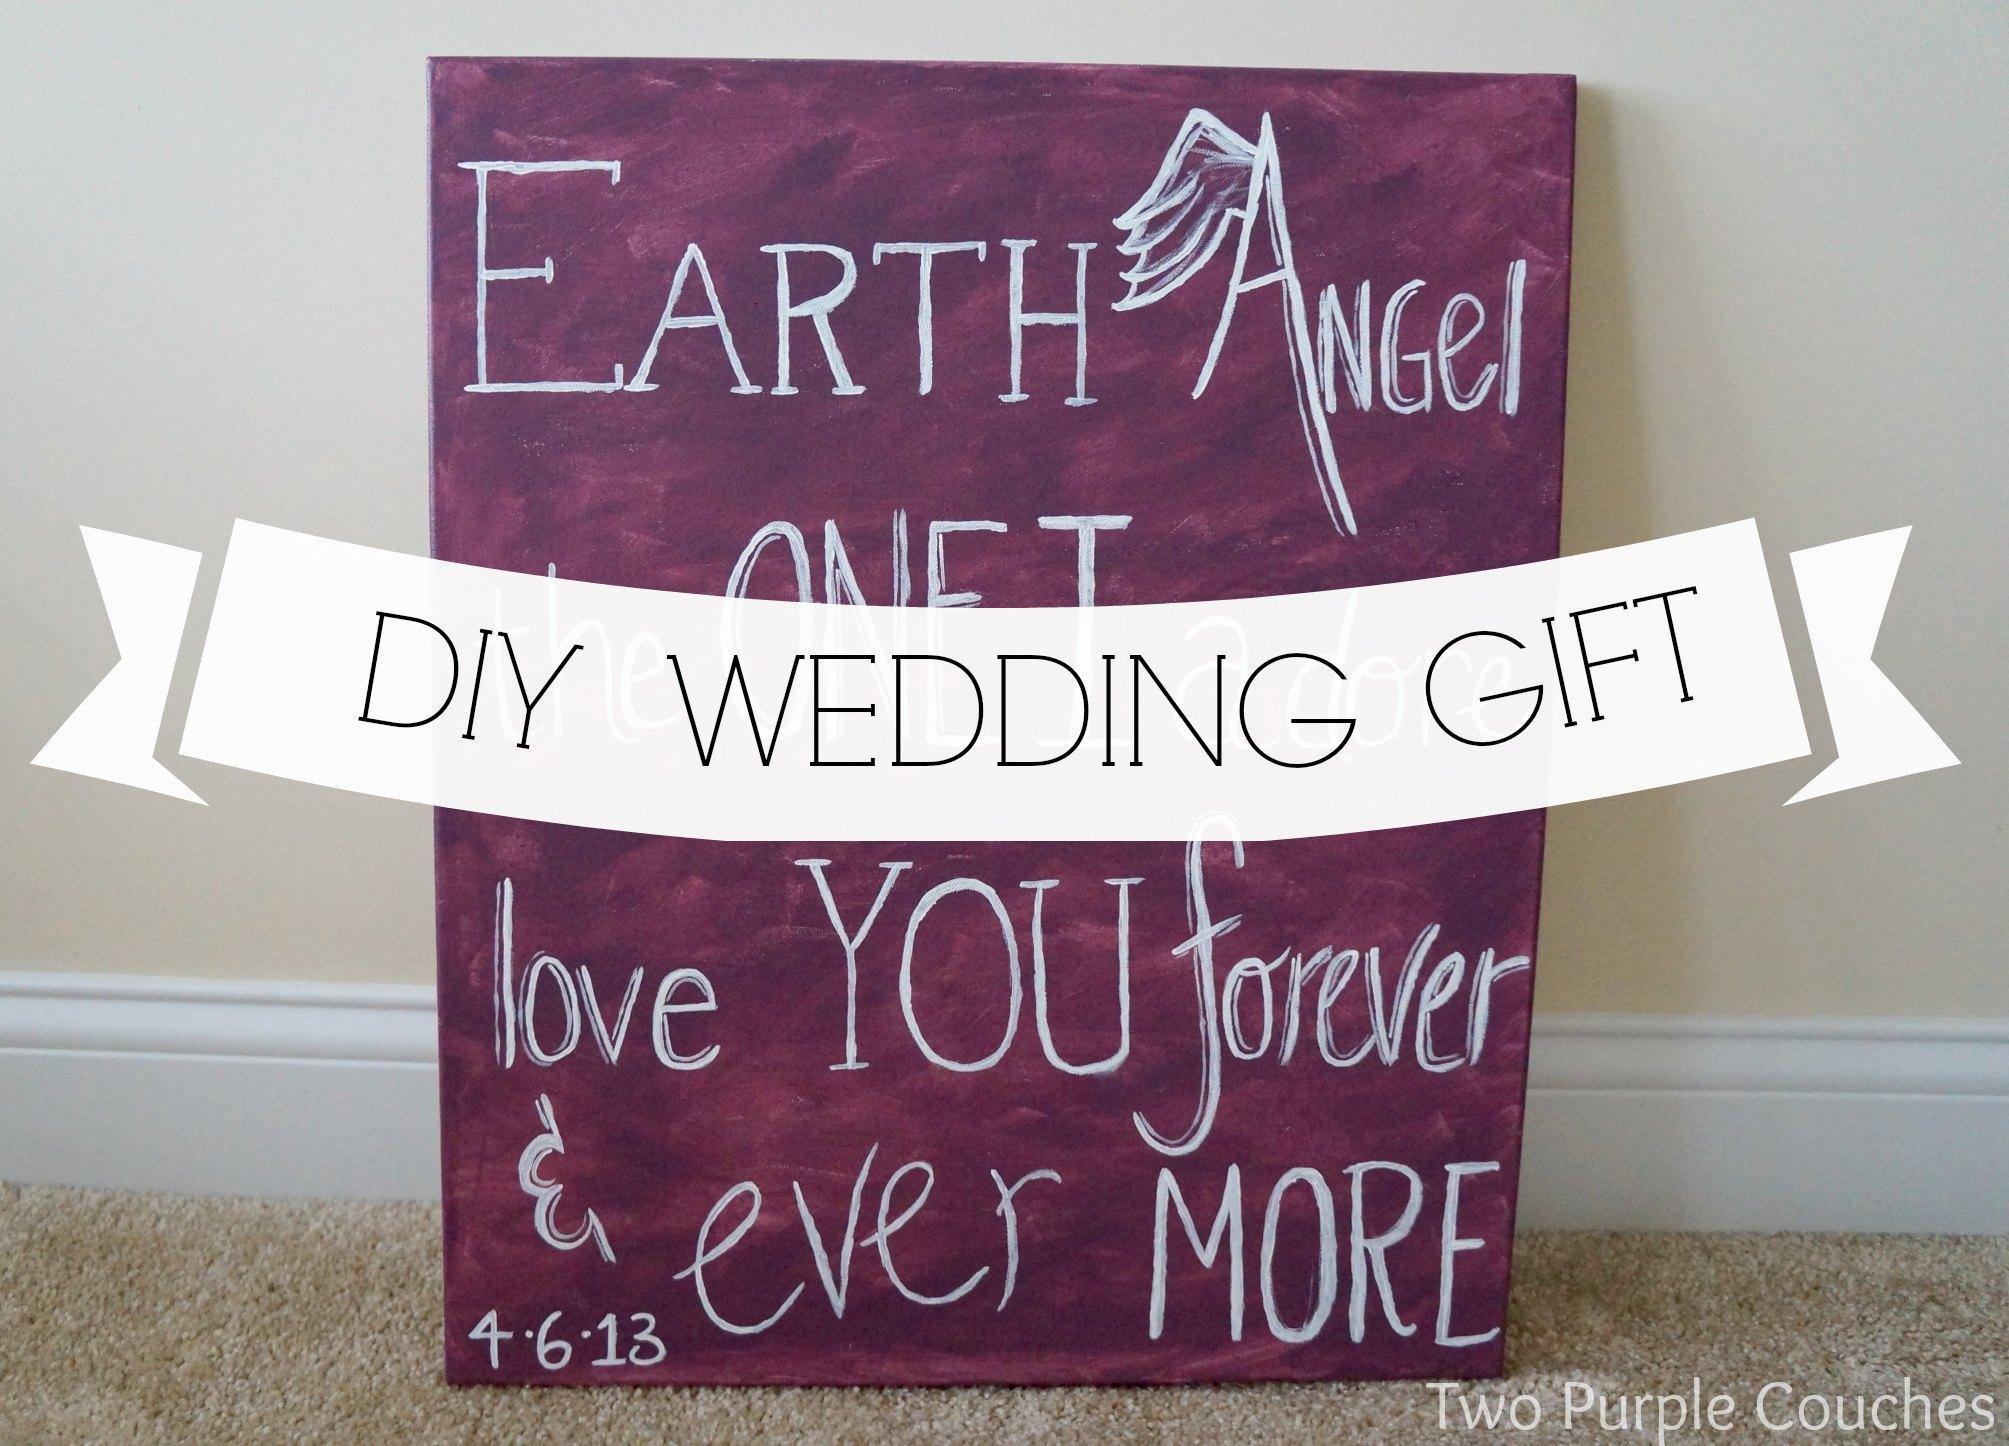 diy wedding gift canvas & DIY Wedding Gift: Lyrics on Canvas - two purple couches